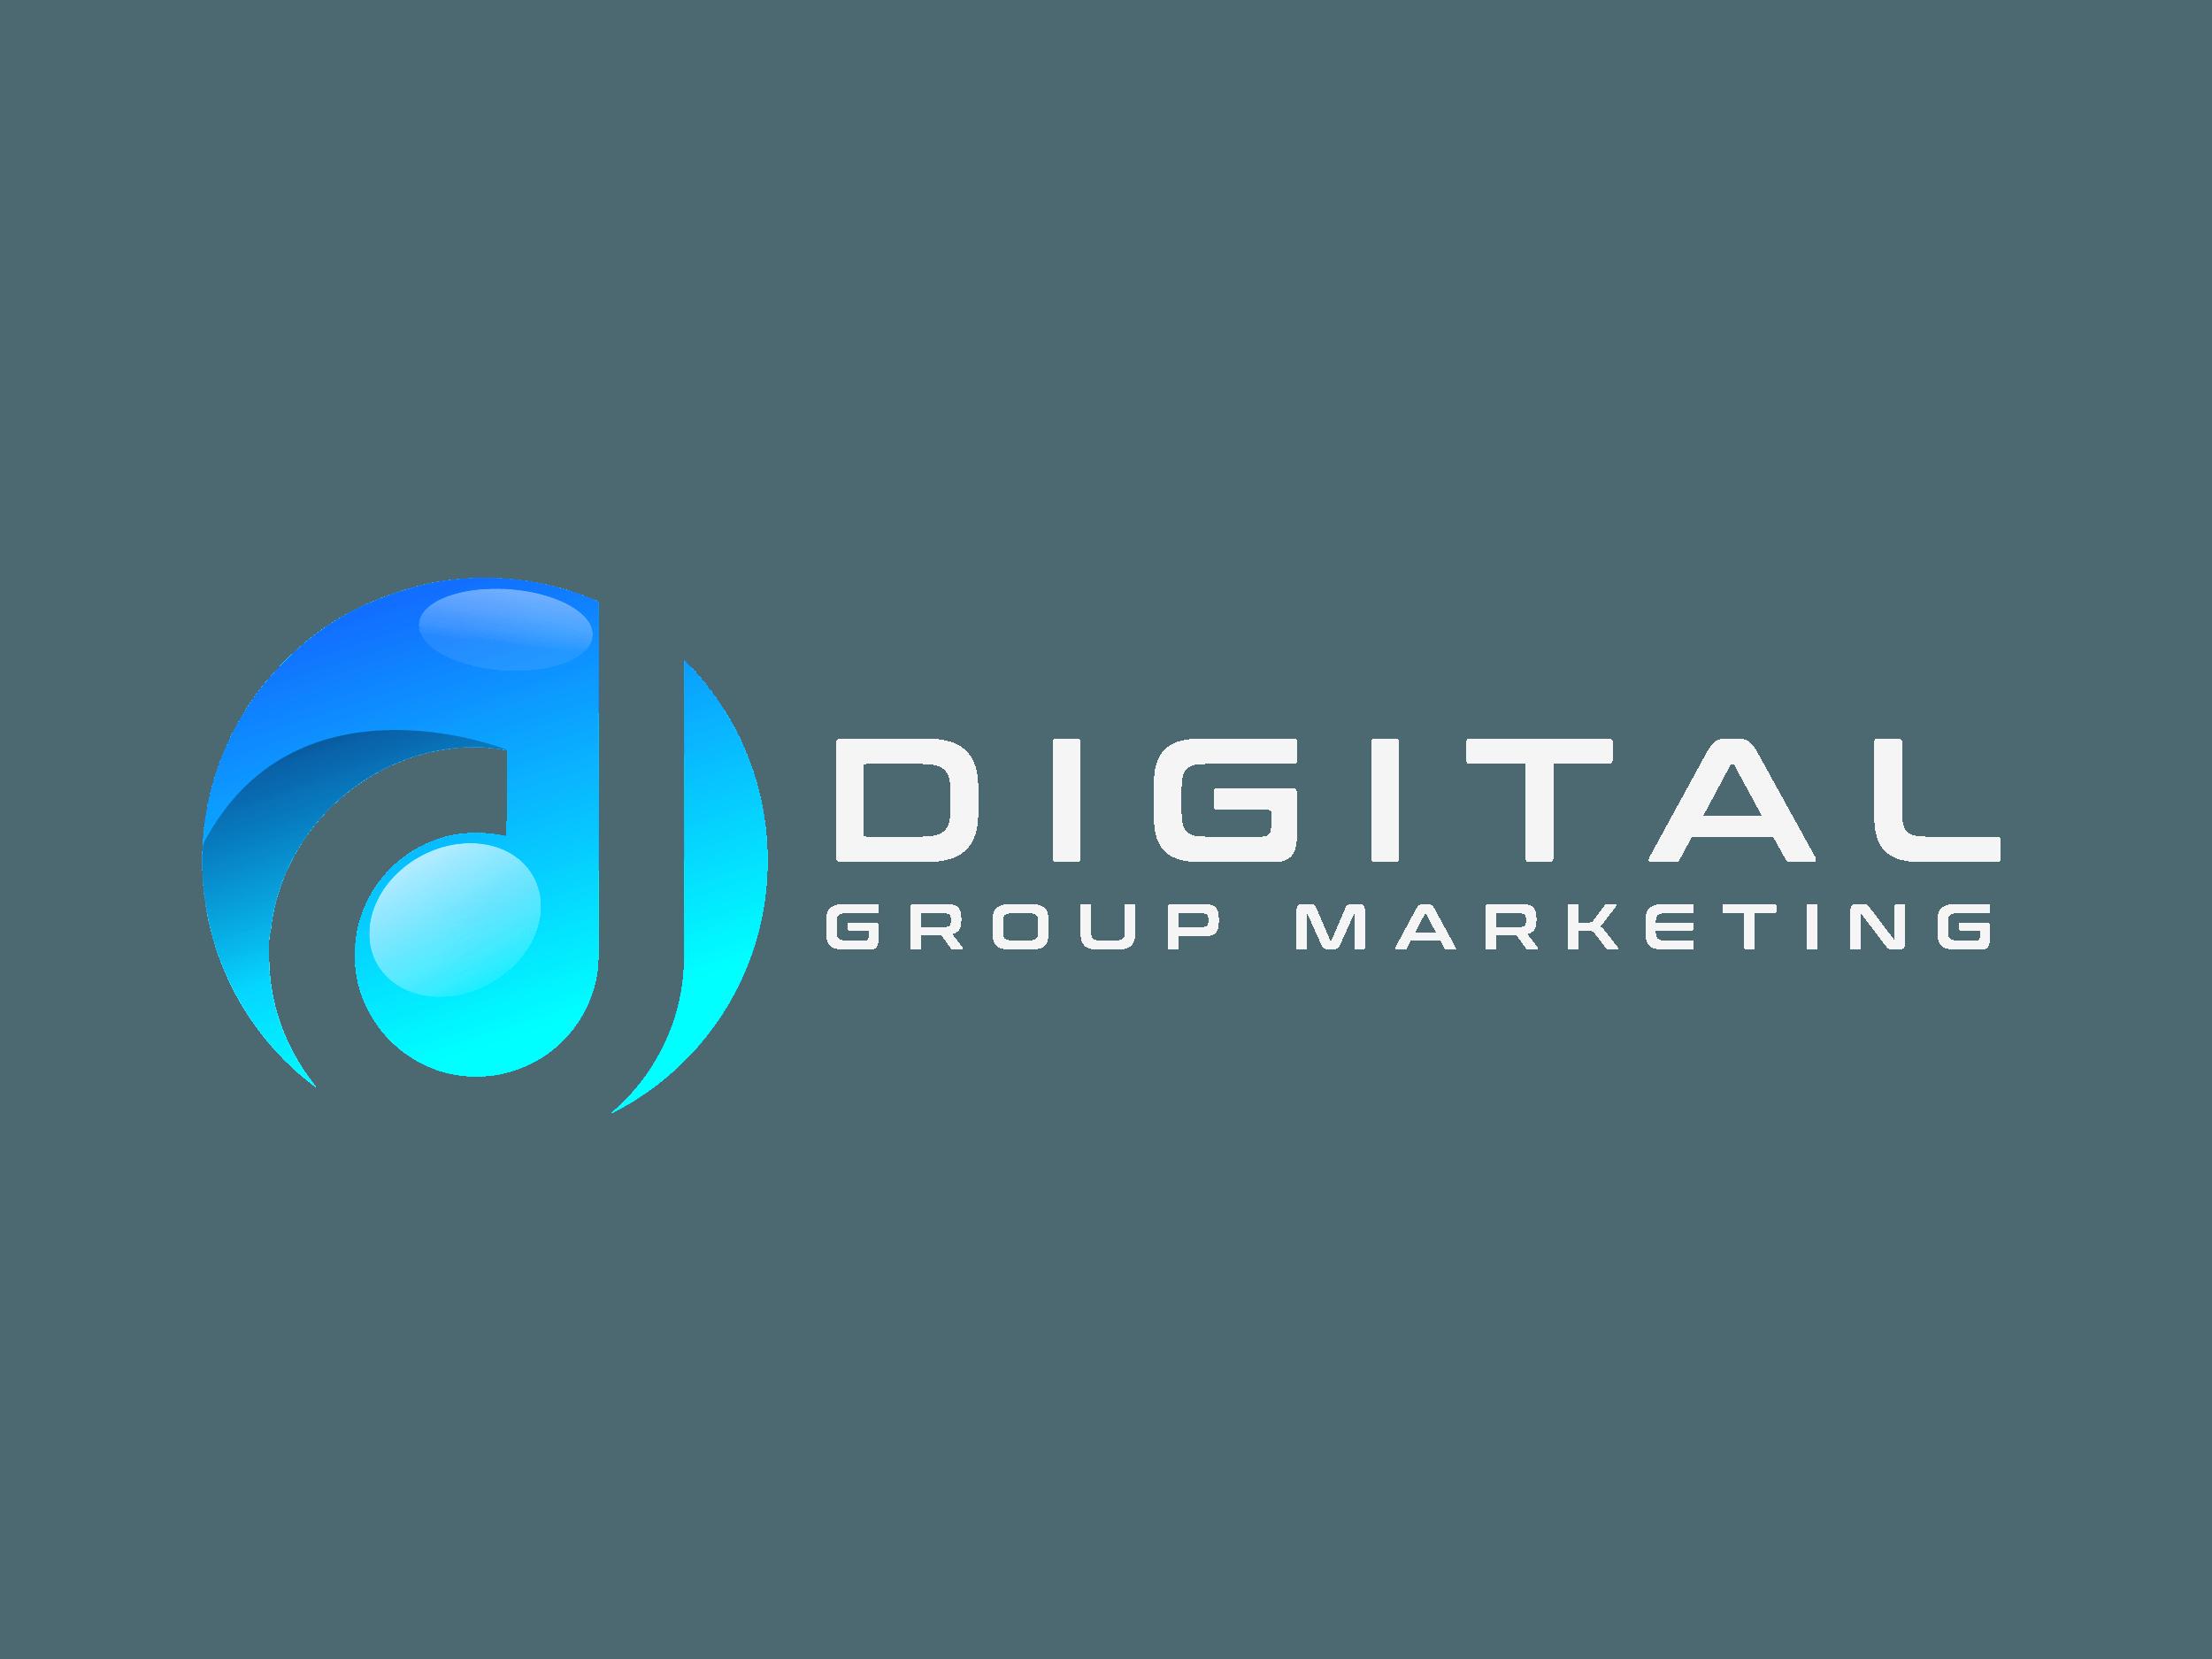 digital group marketing